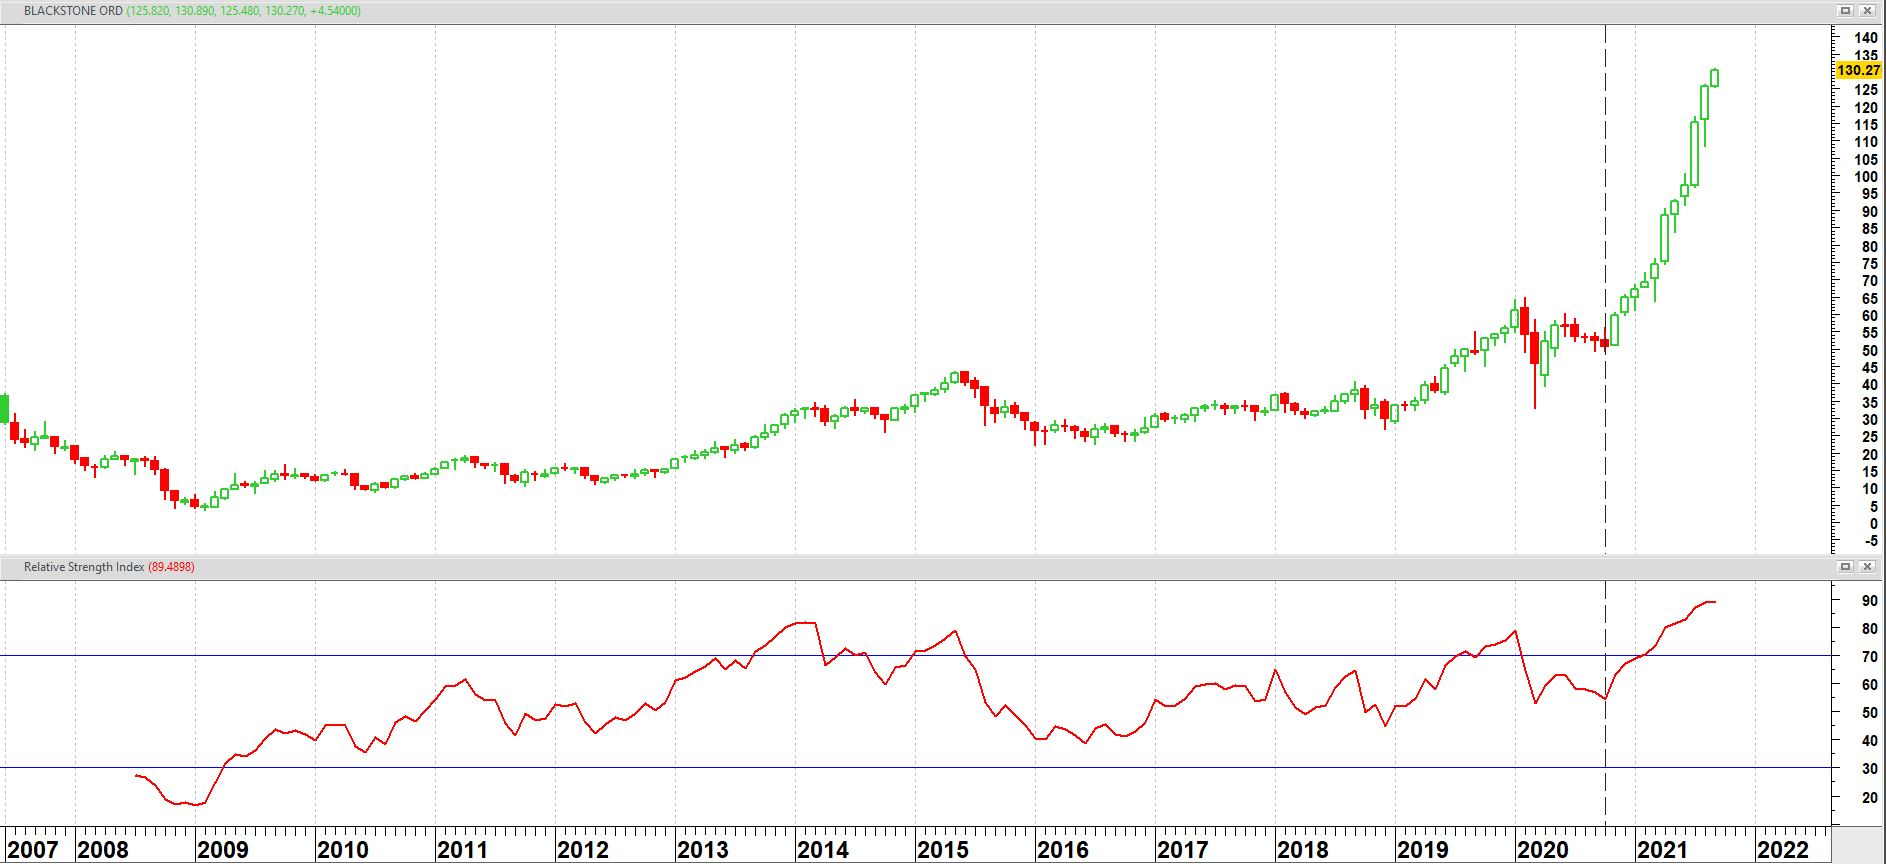 Blackstone Inc. (BX) op maandbasis + relatieve sterkte index (RSI)